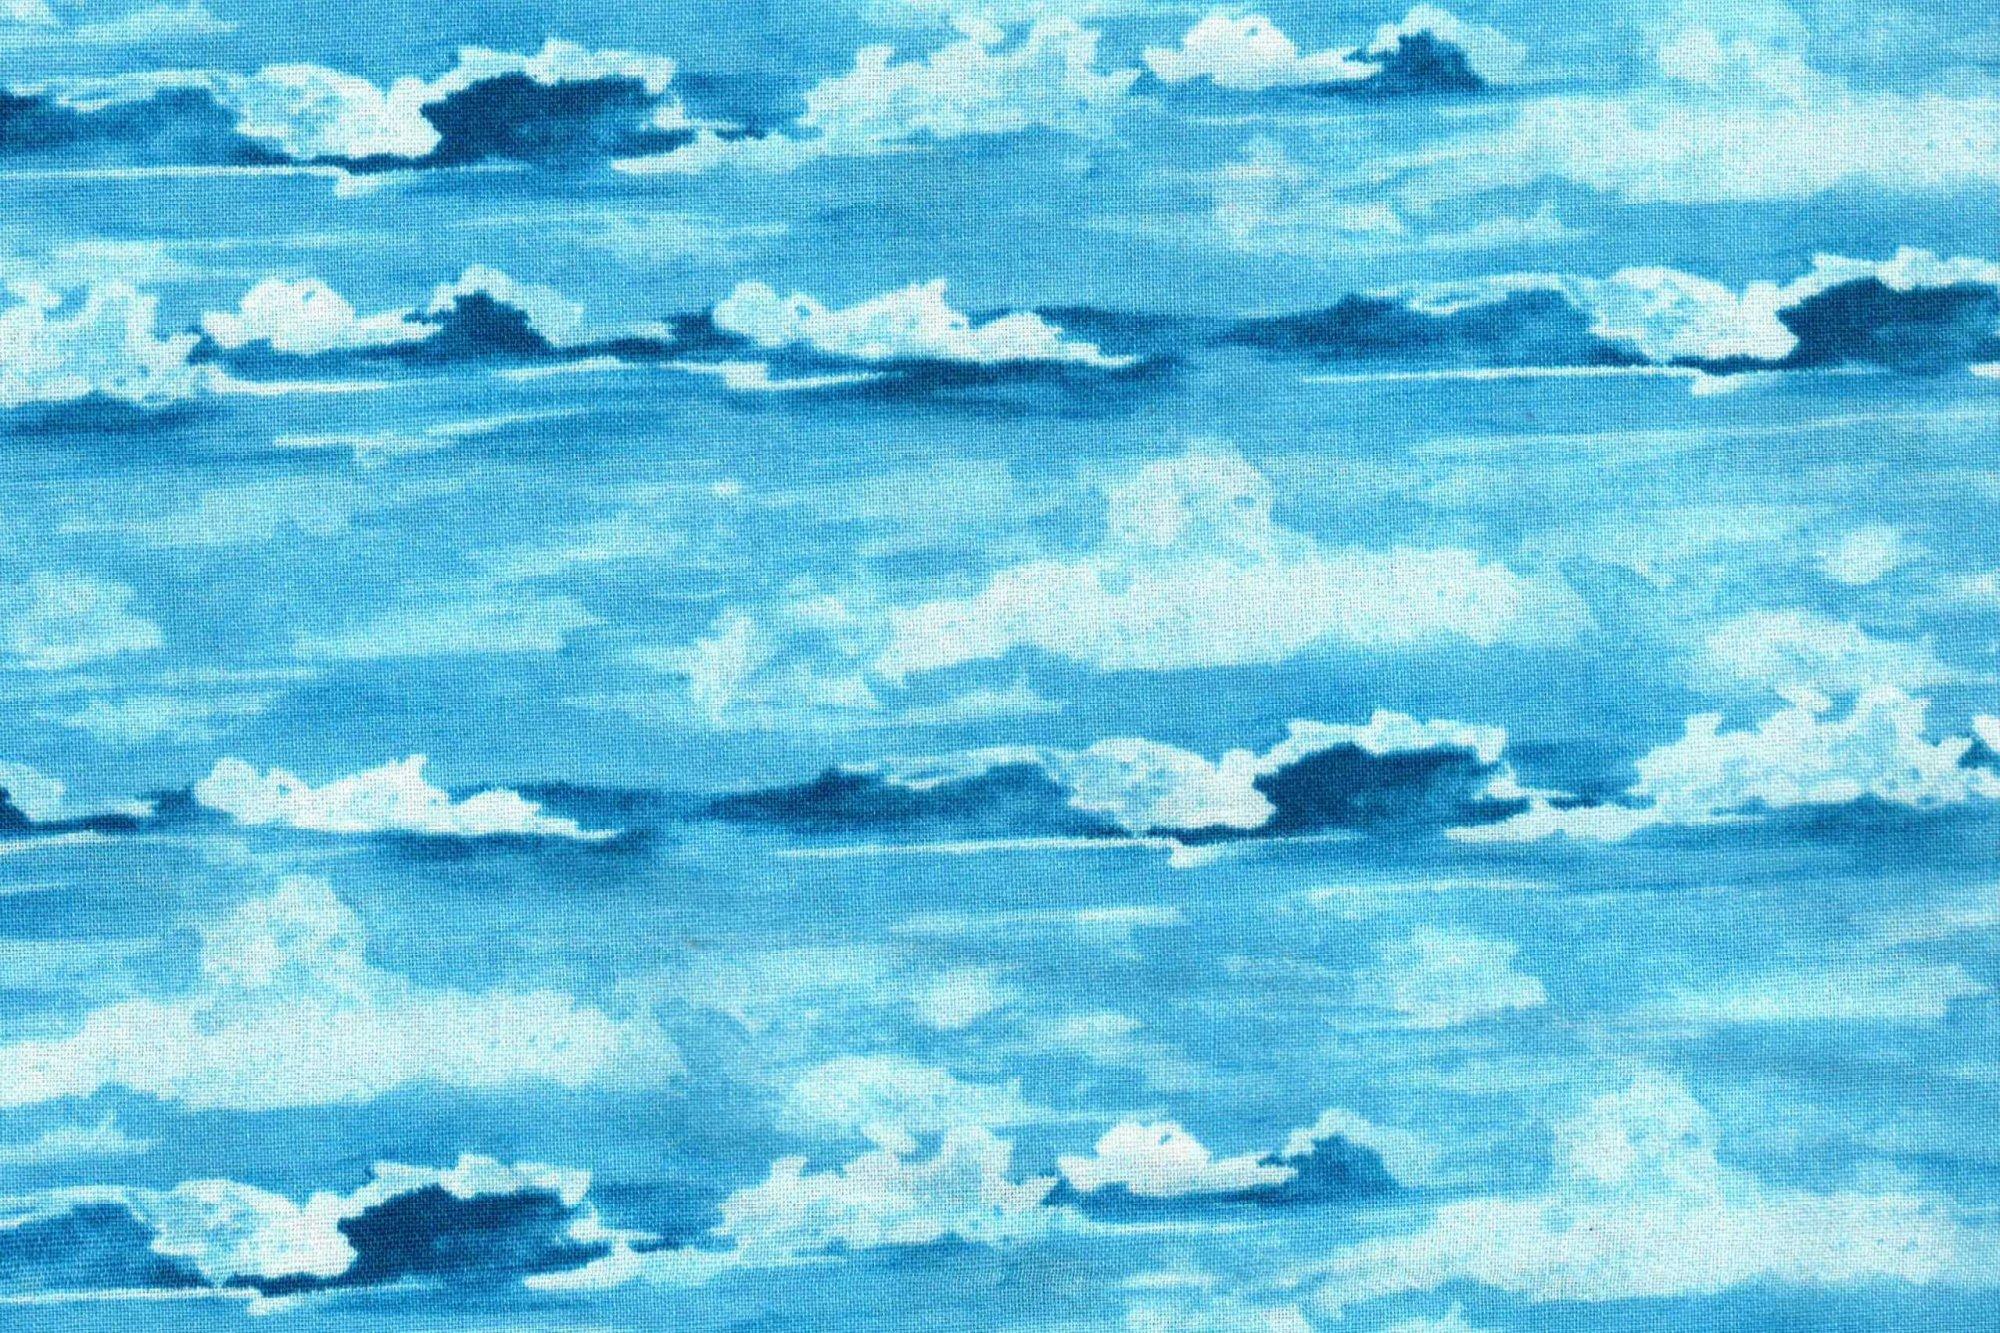 G SOUTH SEA 31602 444-CLOUDS